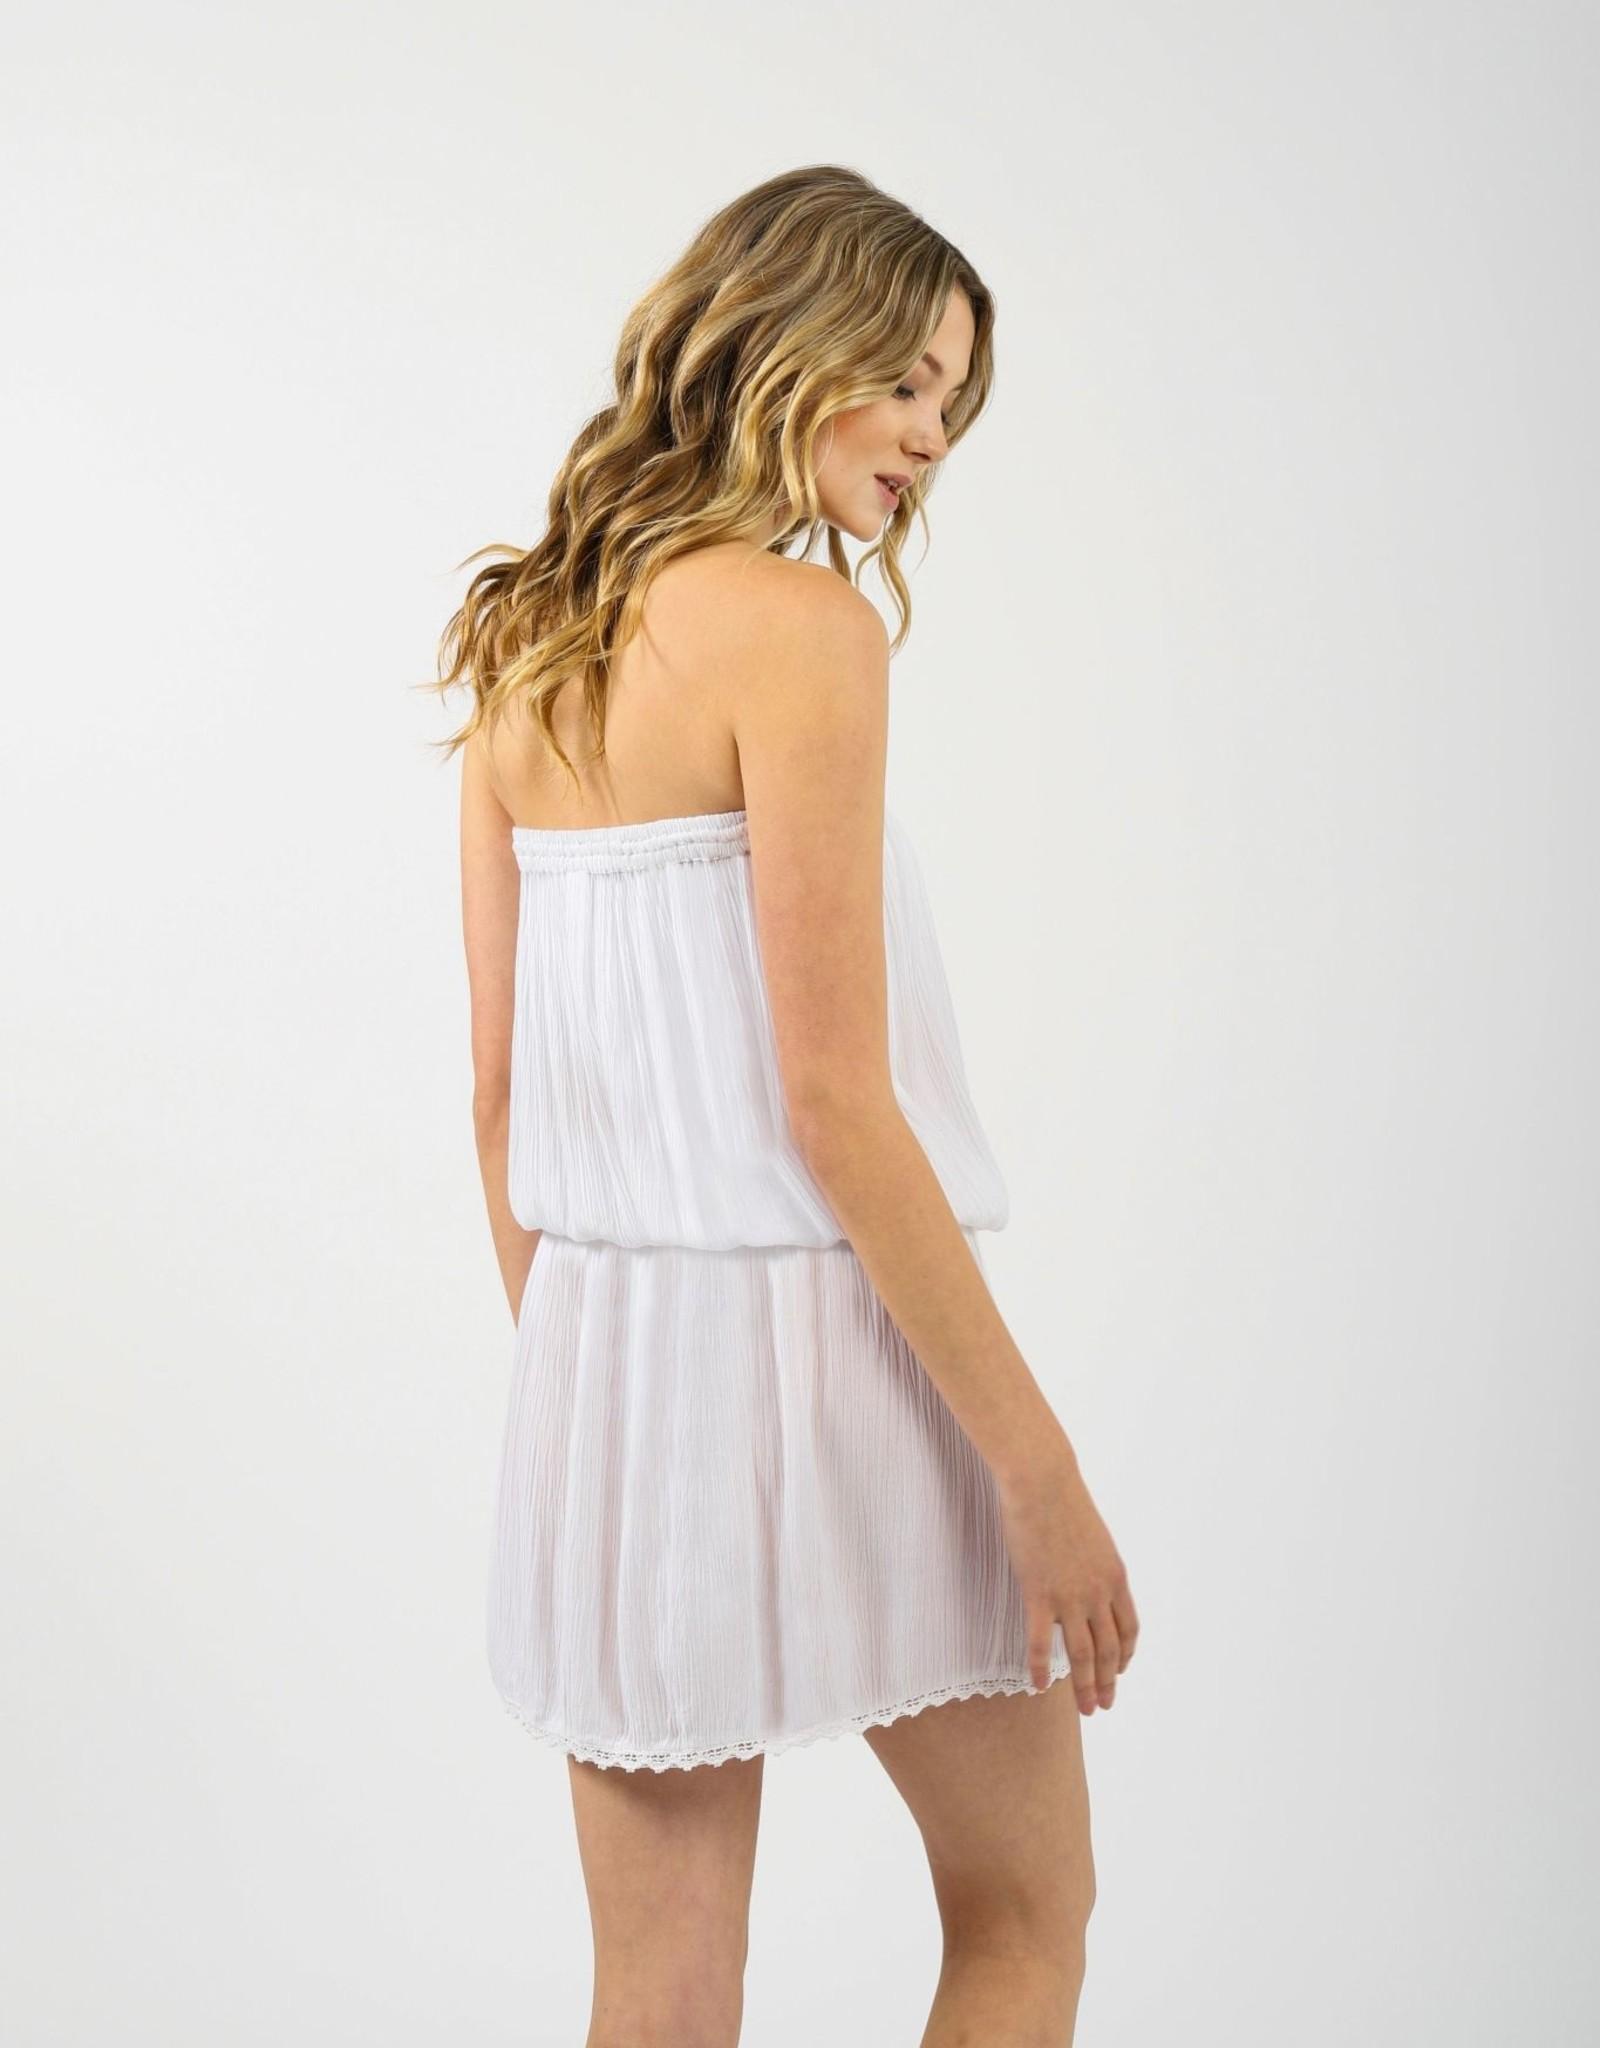 Koy KO Miami Bandeau Dress